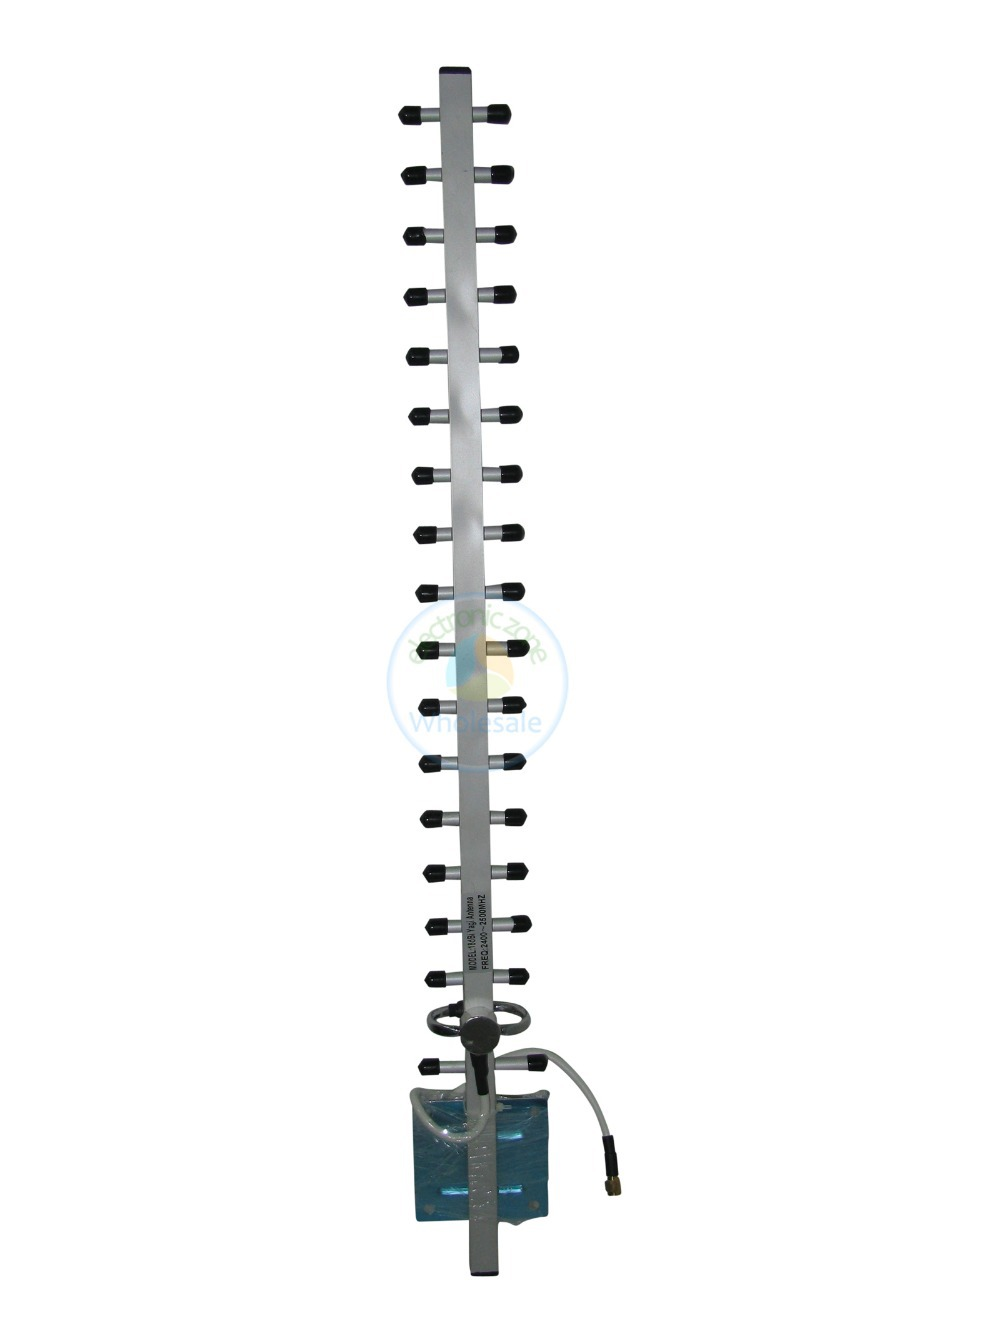 2.4GHz 13dBi Yagi RP-SMA WiFi Antenna Long Range for Linksys E2100L WRT160NL(China (Mainland))